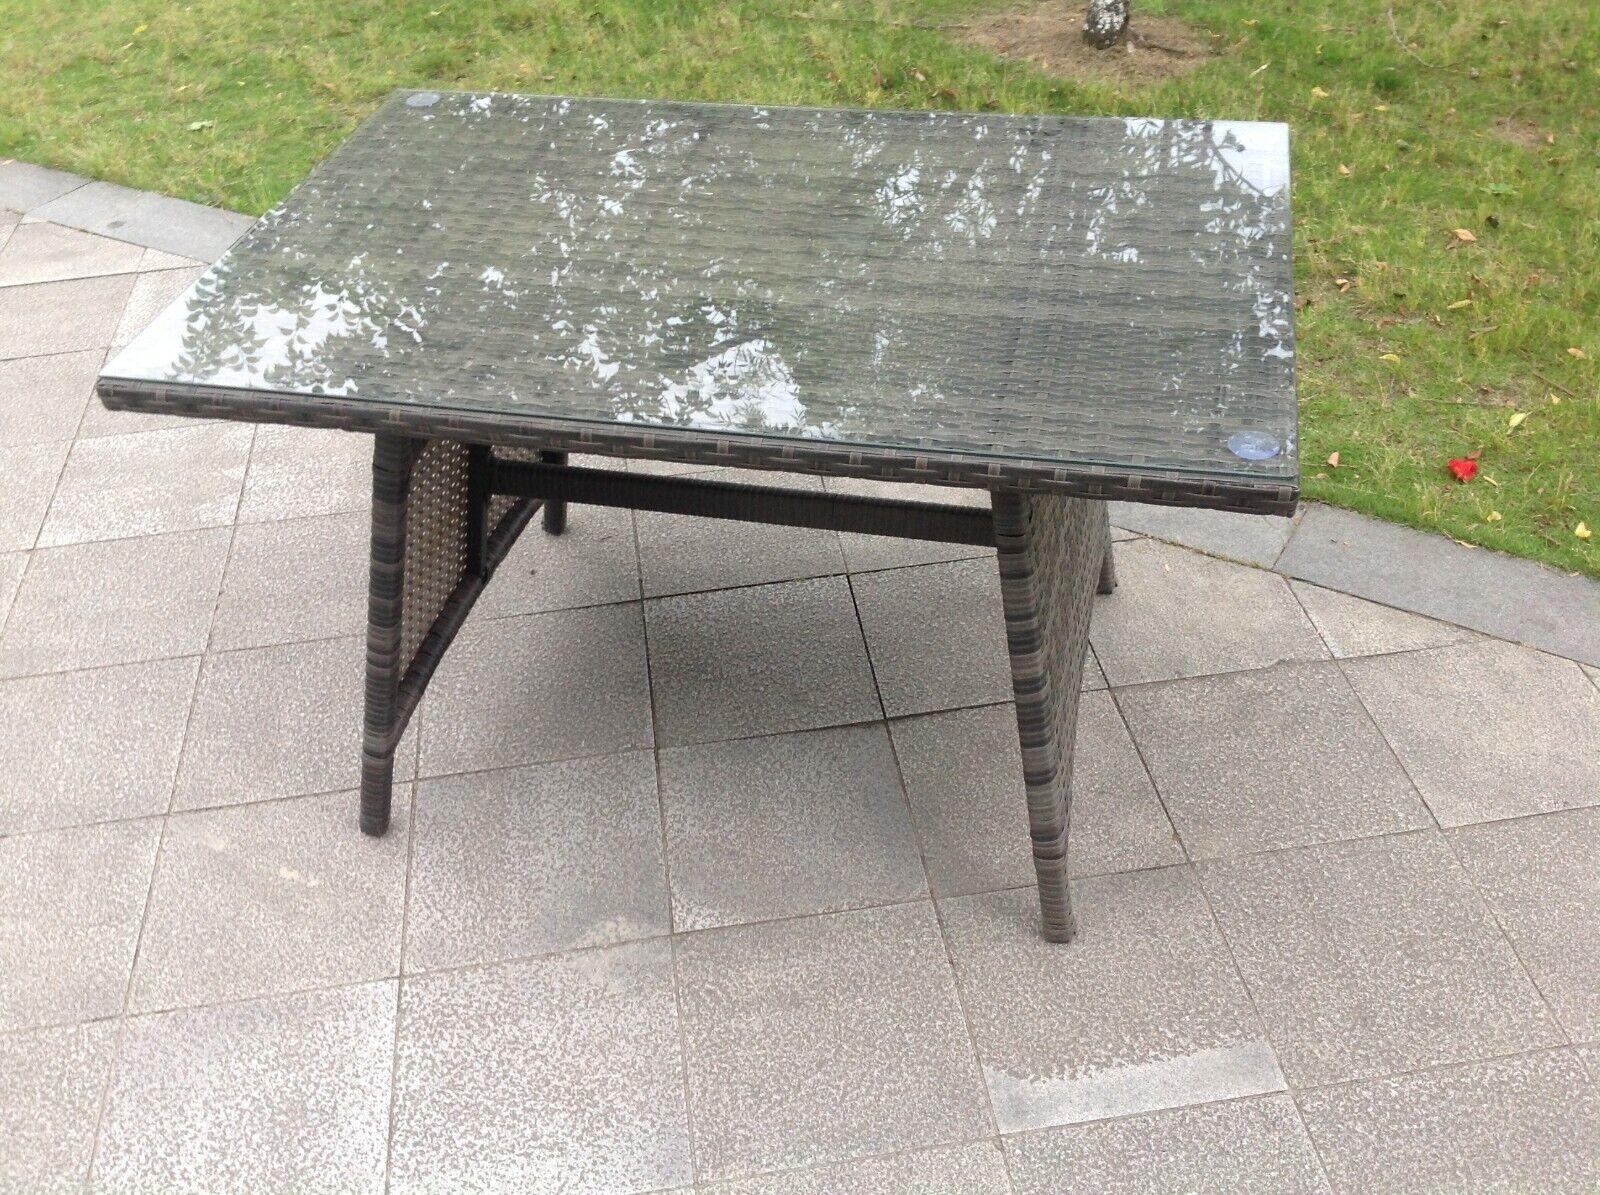 Garden Furniture - Rattan Dining Table Outdoor Garden Furniture Tempered Glass Top Grey Mixed